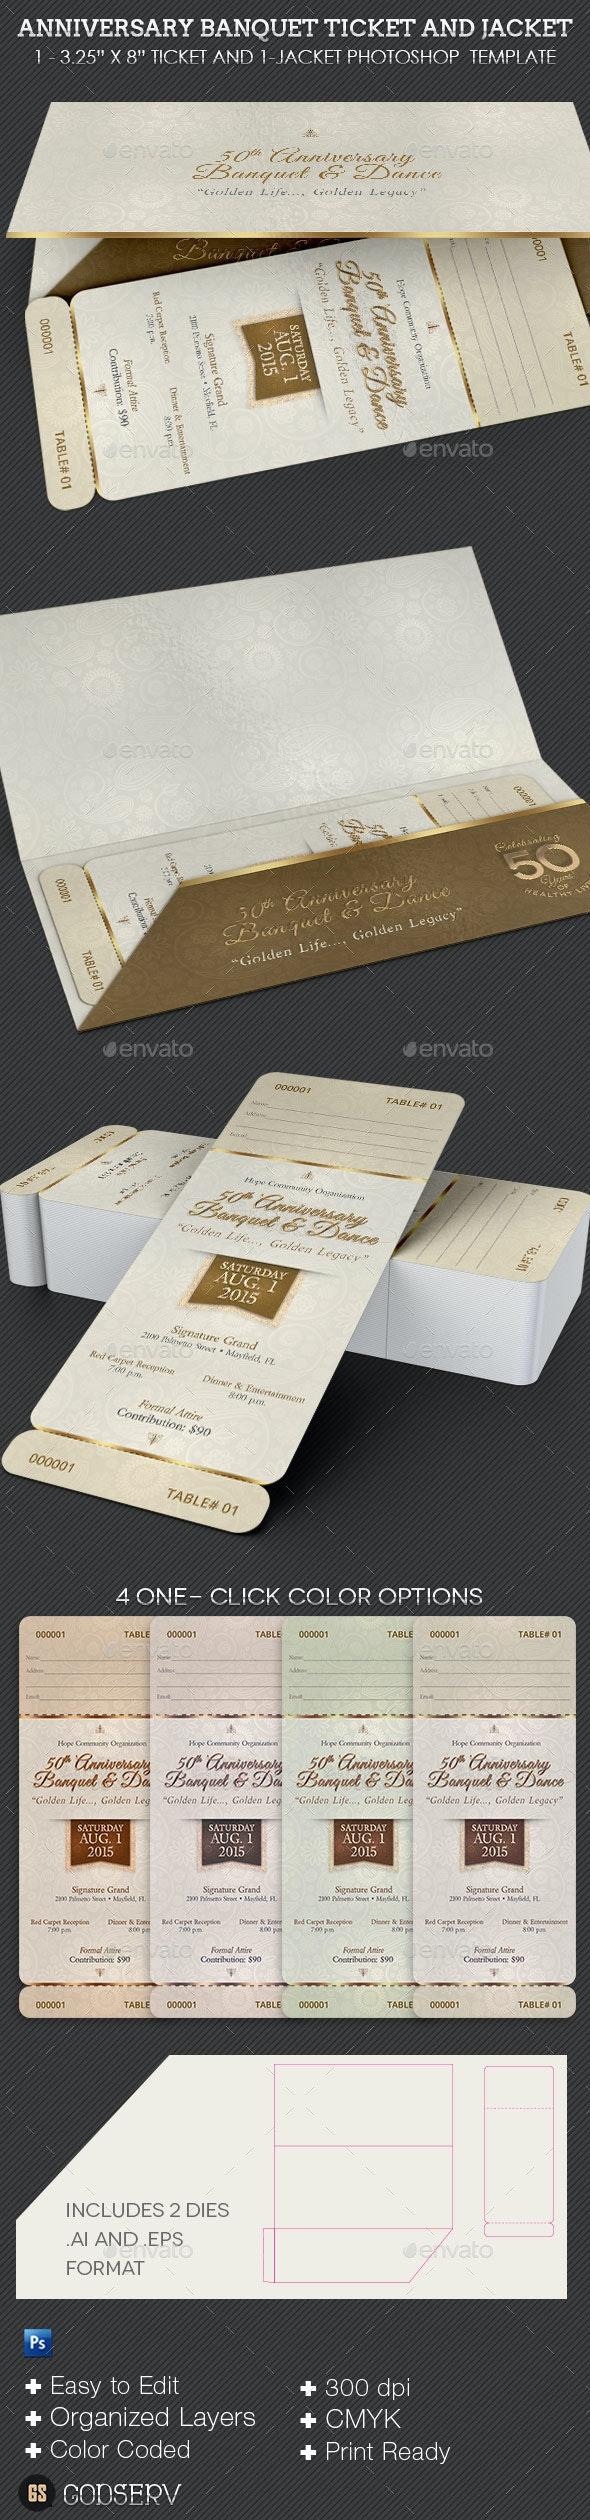 Anniversary Banquet Ticket Plus Jacket Template - Miscellaneous Print Templates